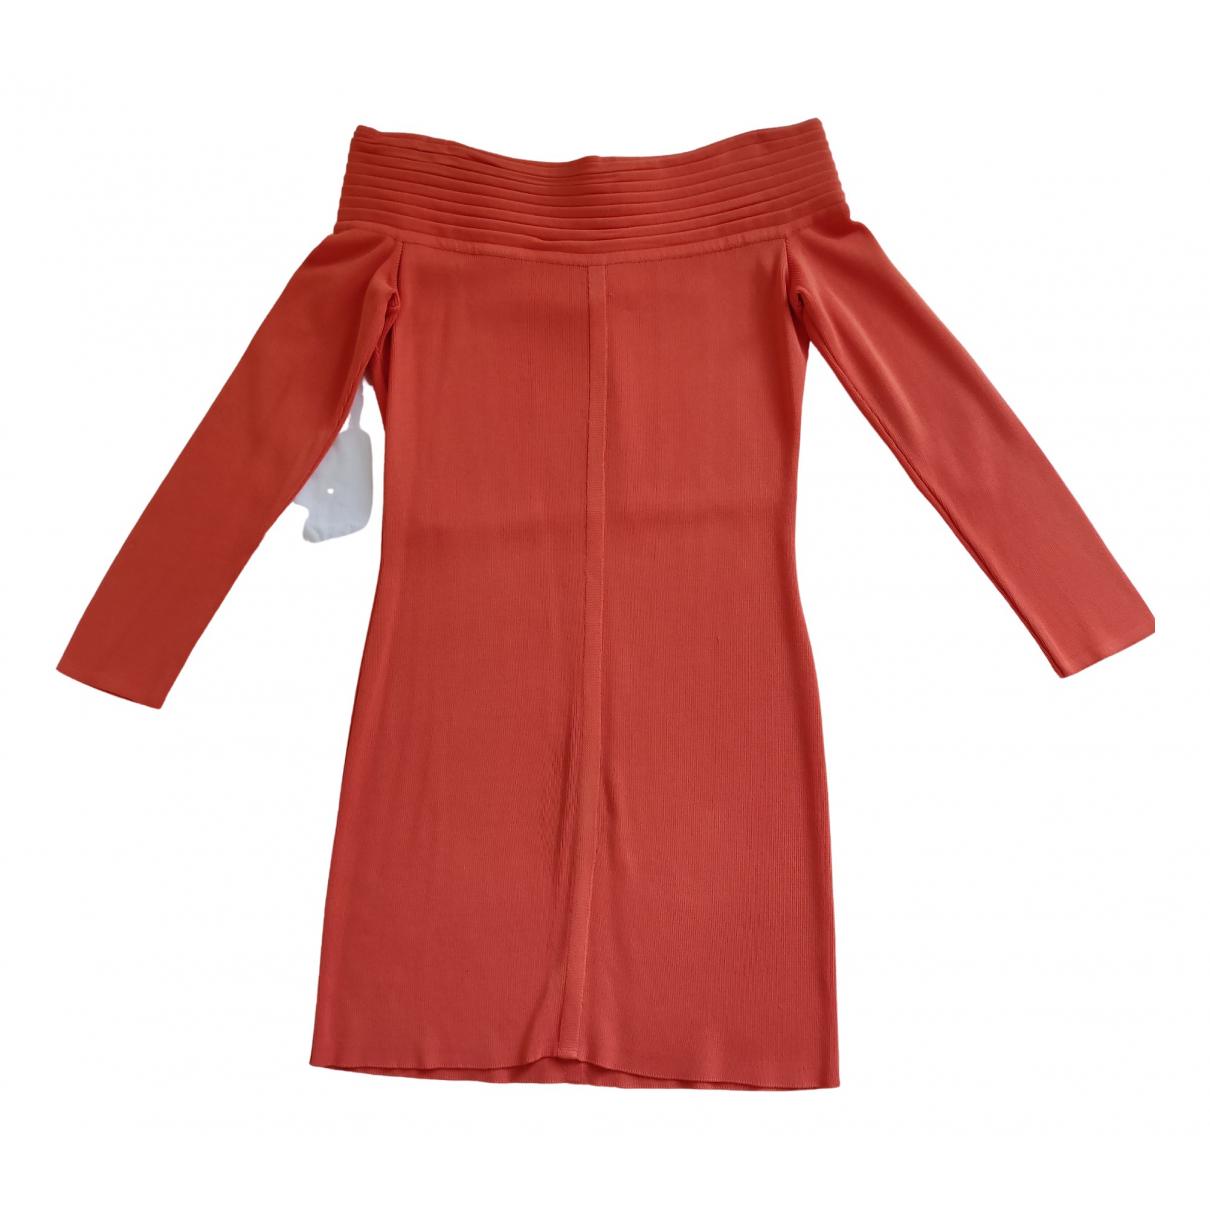 Paco Rabanne \N Orange dress for Women 38 FR